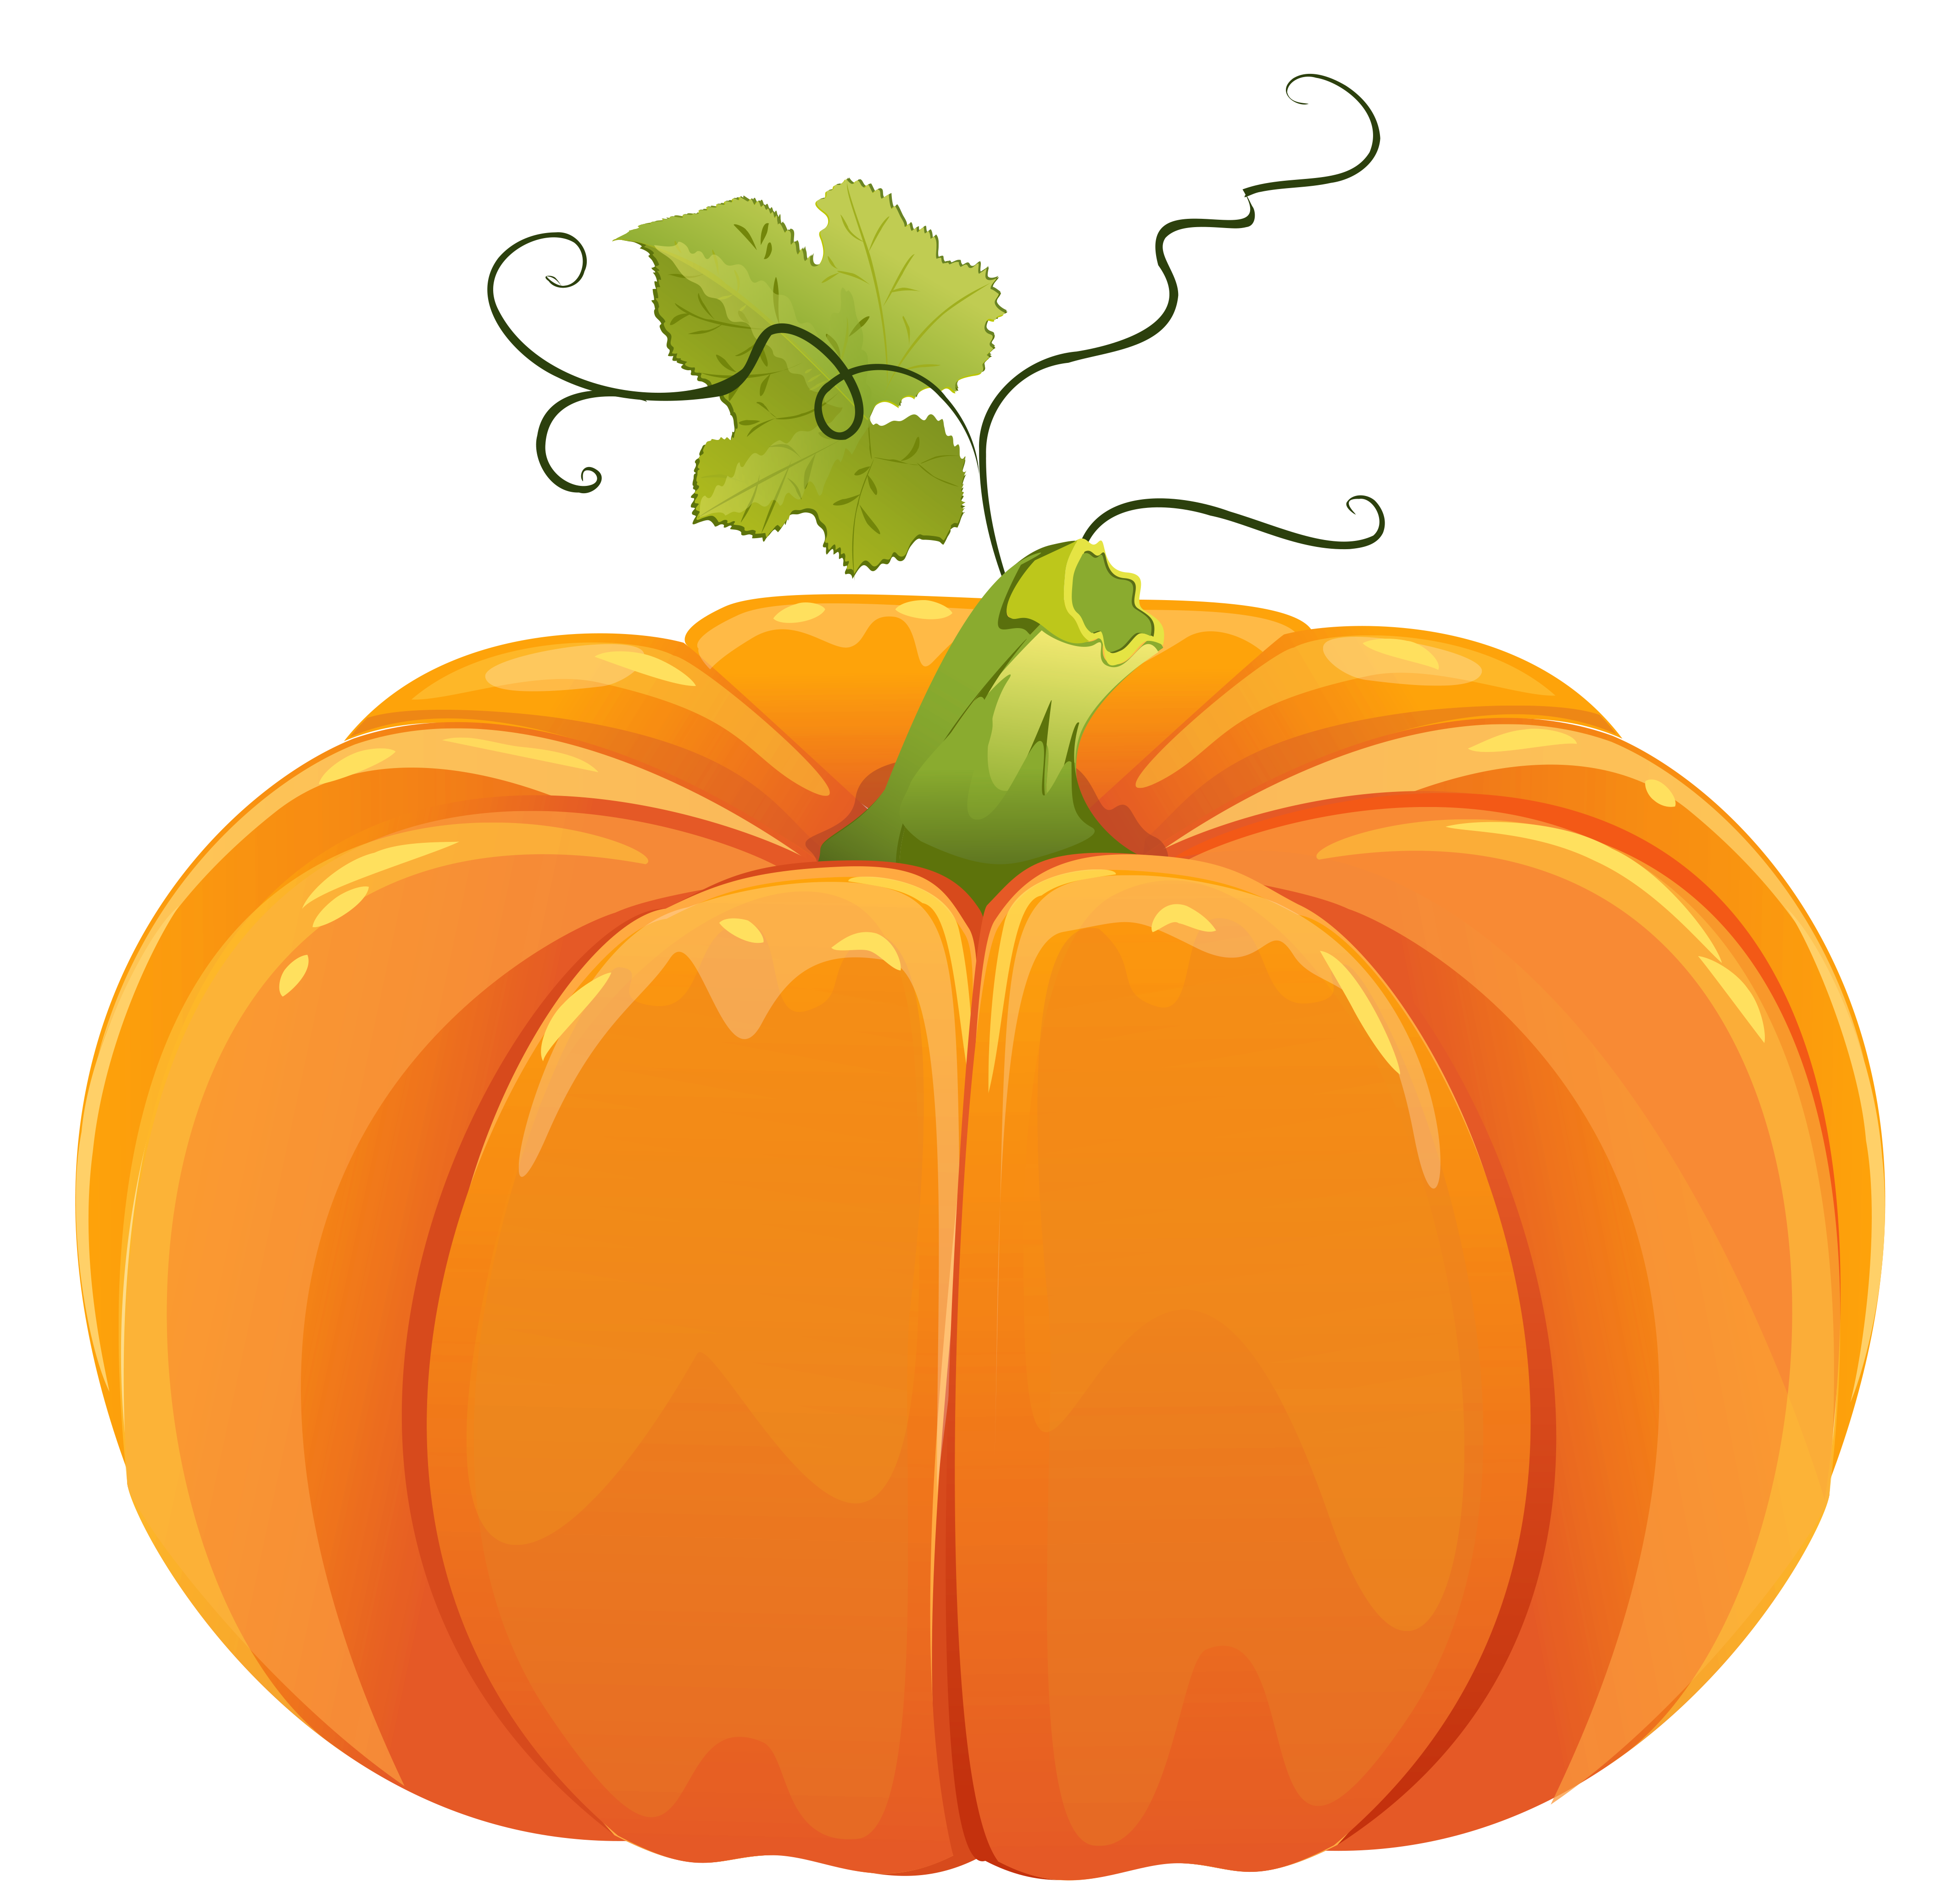 Clip art of a pumpkin